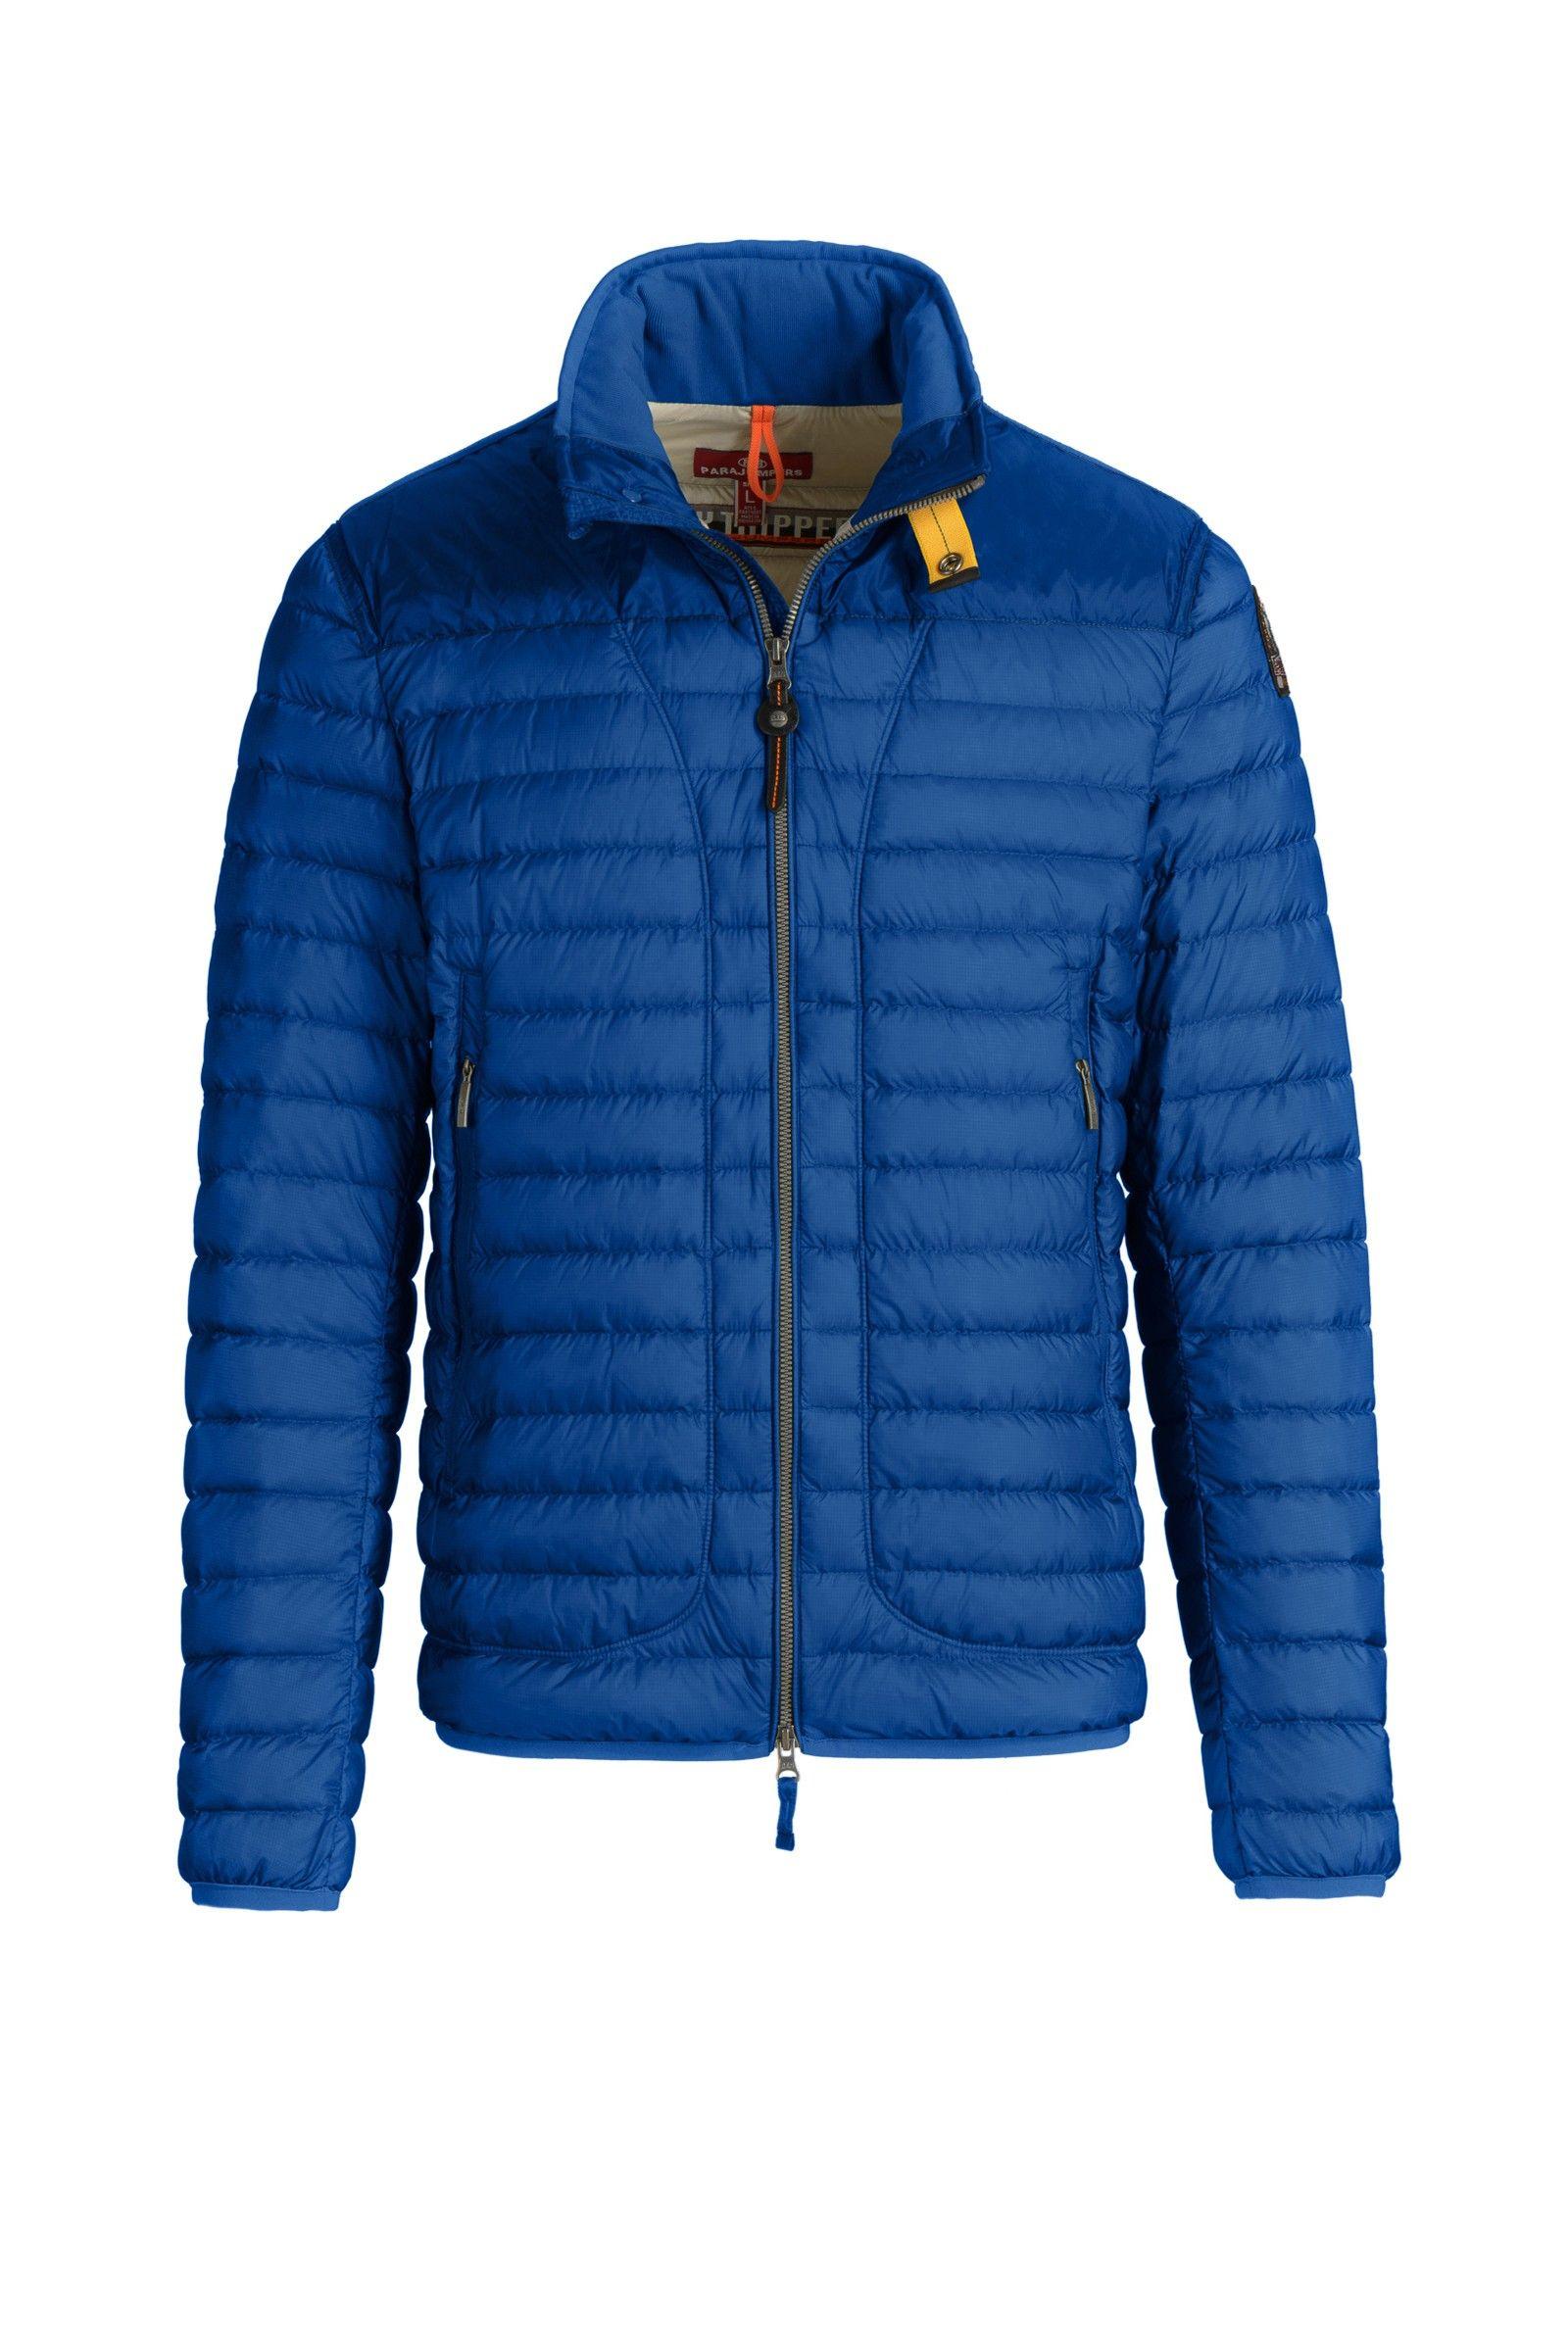 parajumpers arthur jacket